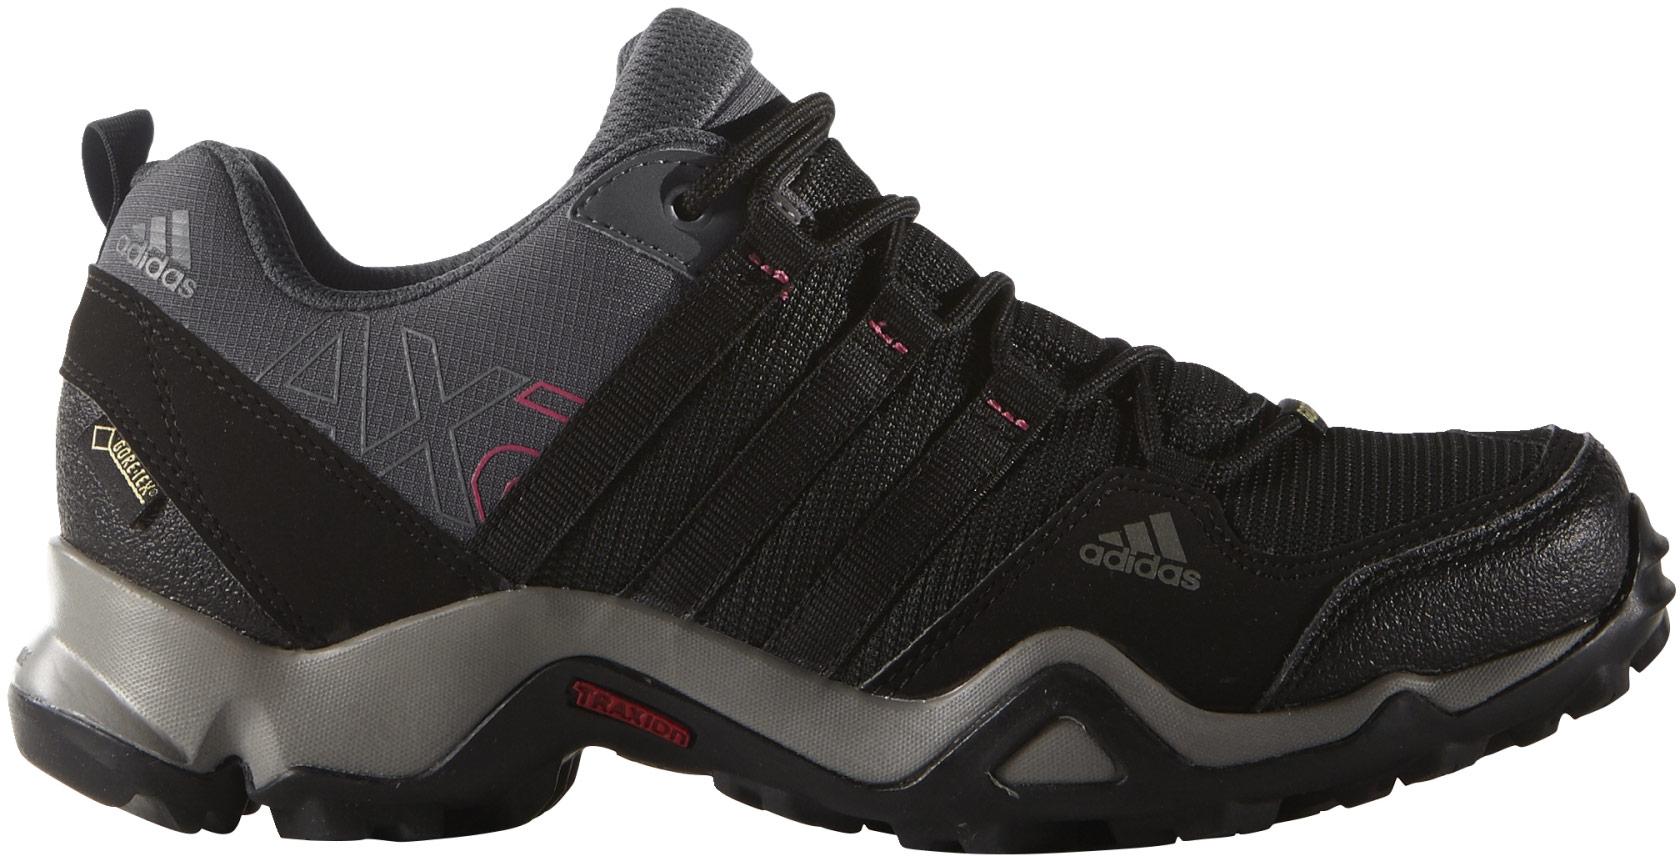 Gtx Gtx Multisports Adidas adidas Ax2 Chaussures QdCtsrh